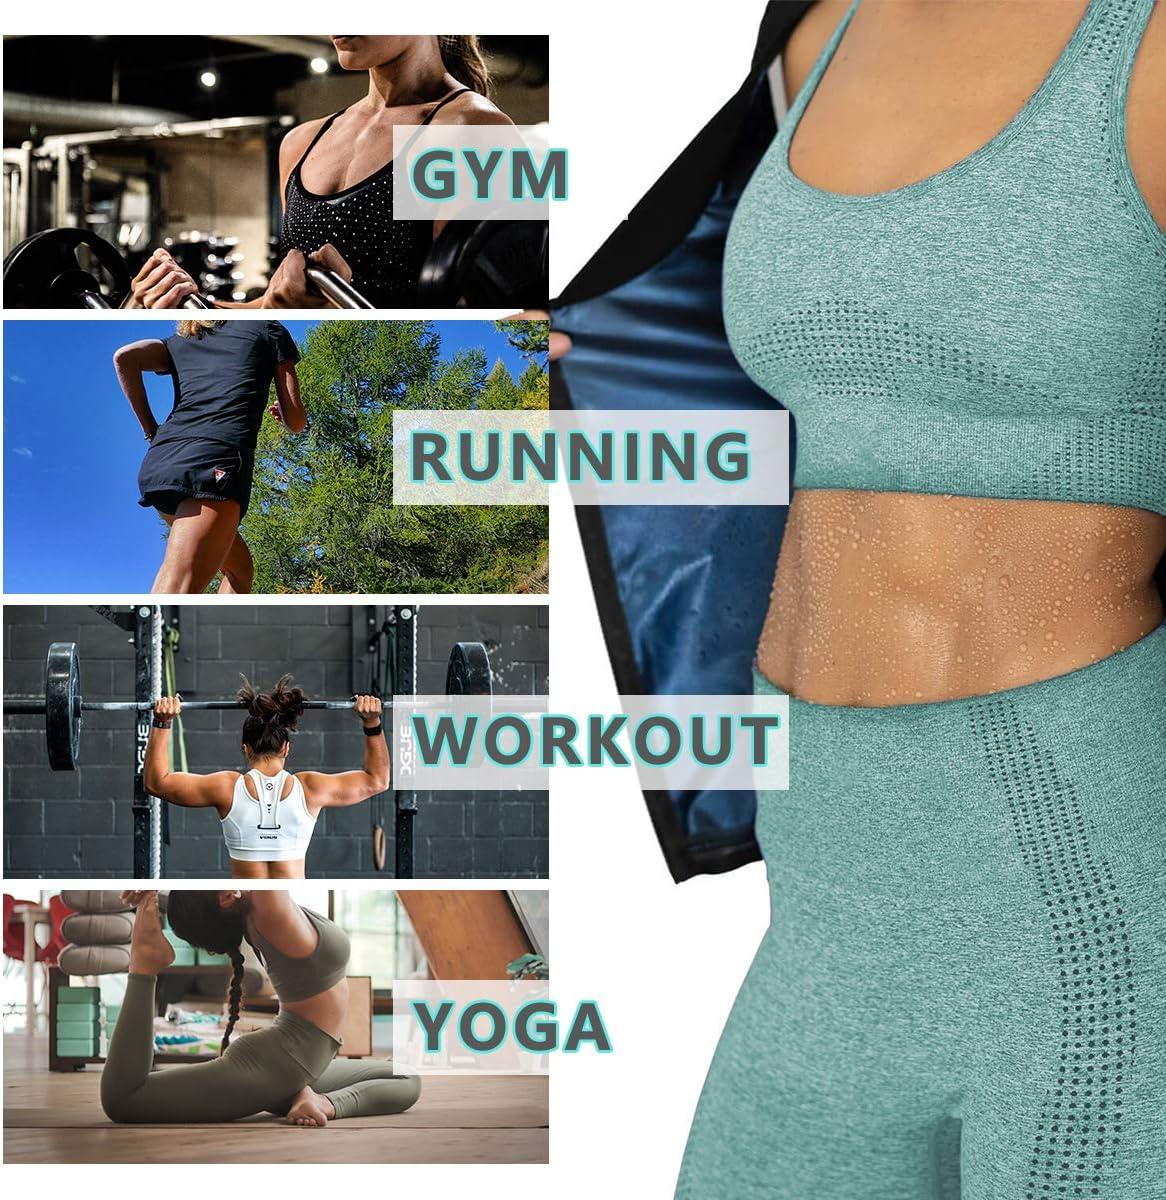 INRLKIT Women Waist Trainer Vest Slim Corset Polymer Sauna Tank Top Zipper Body Shaper Shirt